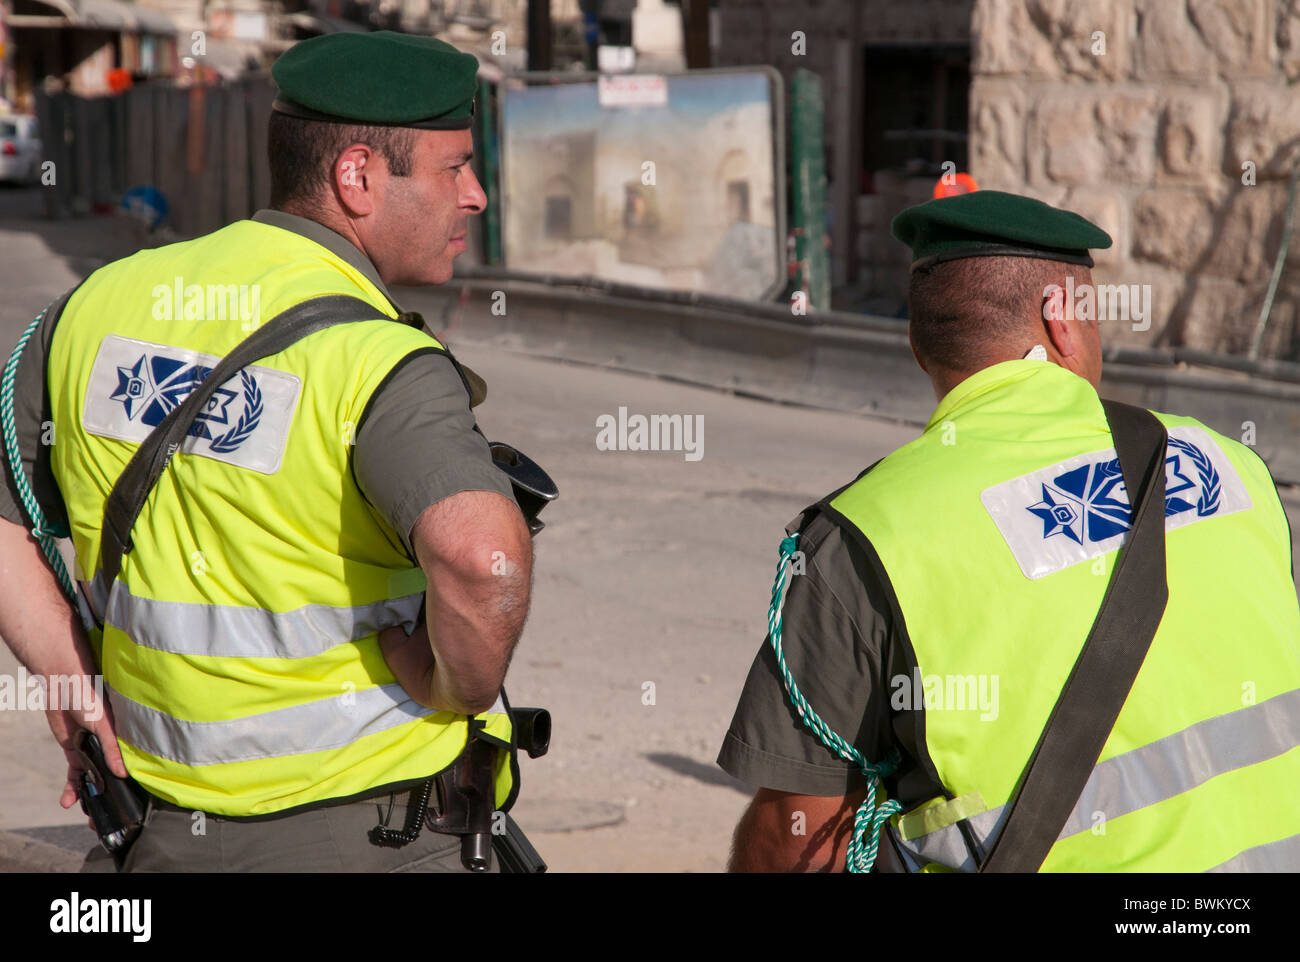 Two israeli border patrols guarding at the Jaffa gate. Jerusalem Old City - Stock Image